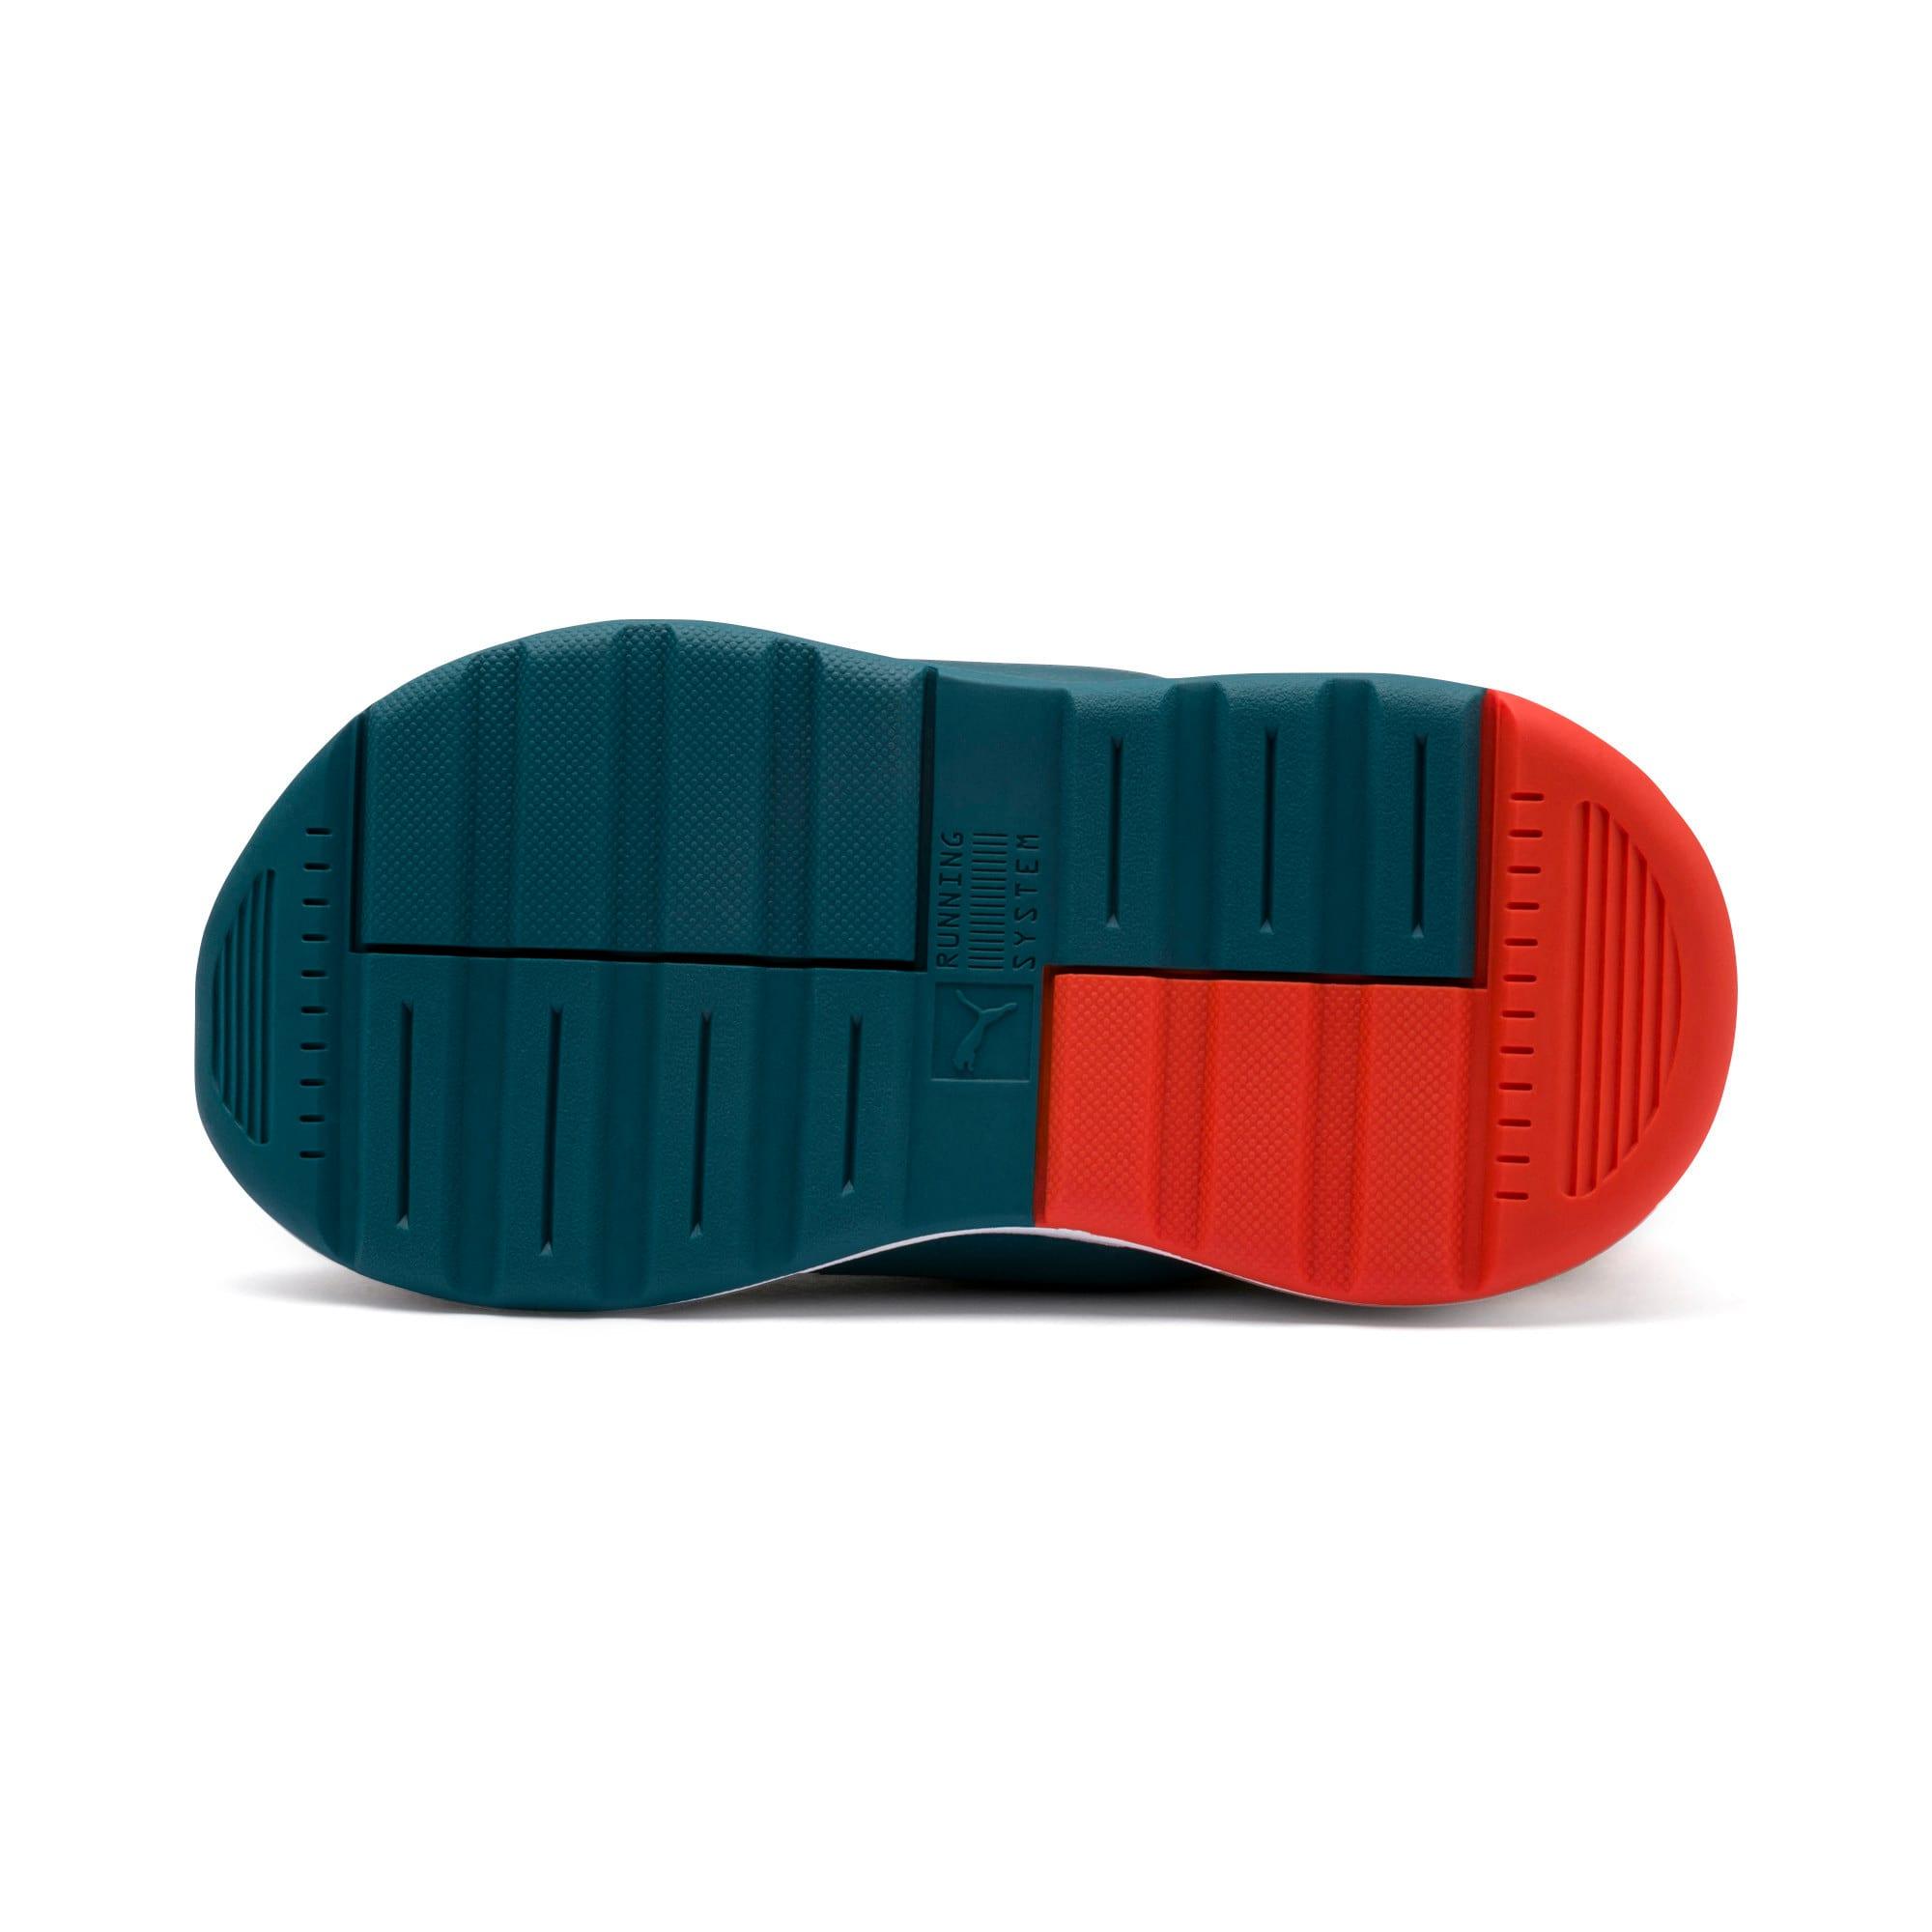 Thumbnail 4 of Sesame Street 50 RS-0 AC Toddler Shoes, Rose-BlueCoral-Dandelion, medium